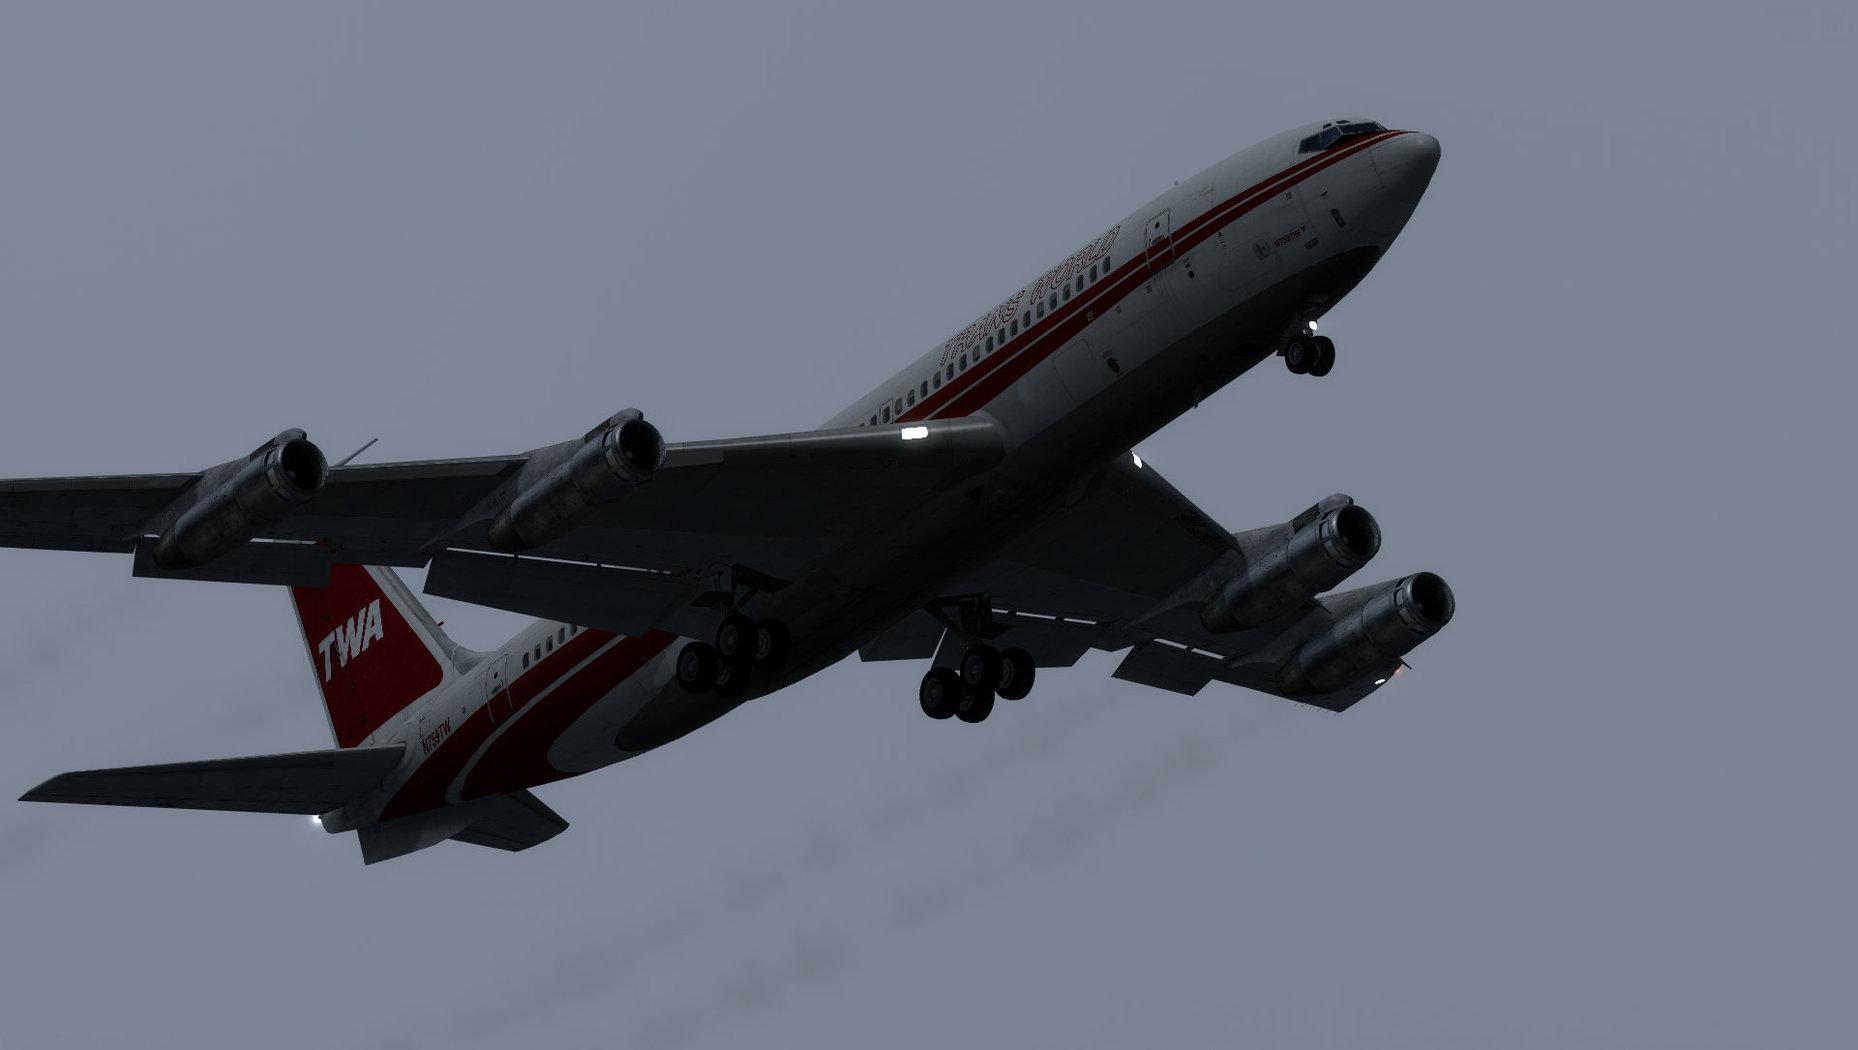 B-737-320B - 1.jpg